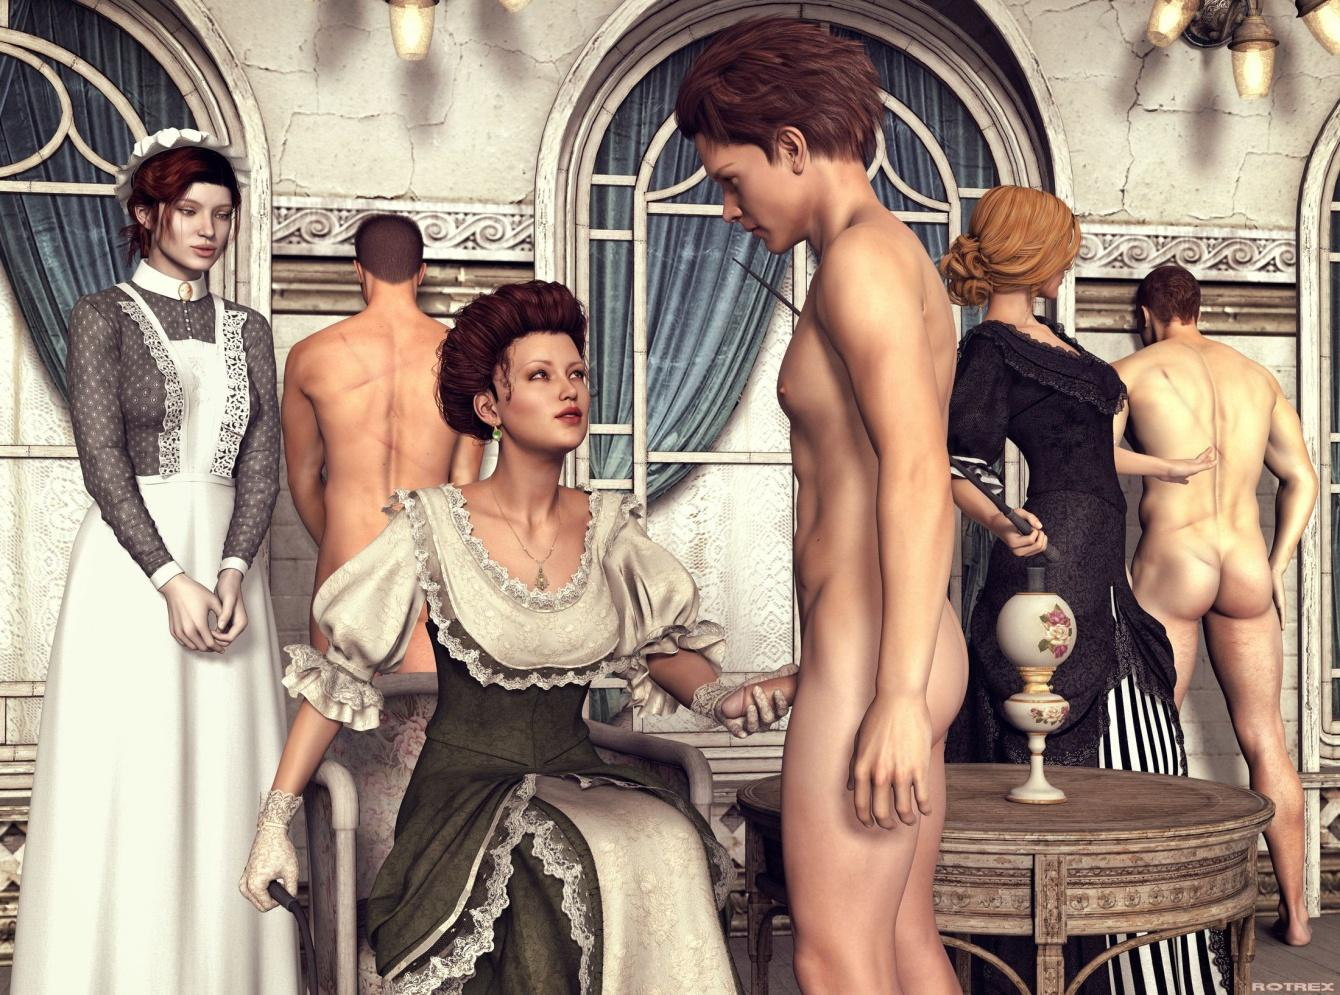 I:\Mijn afbeeldingen\temp desktop\boys spanked\new-slave-male-disciplinary-lessons.jpg